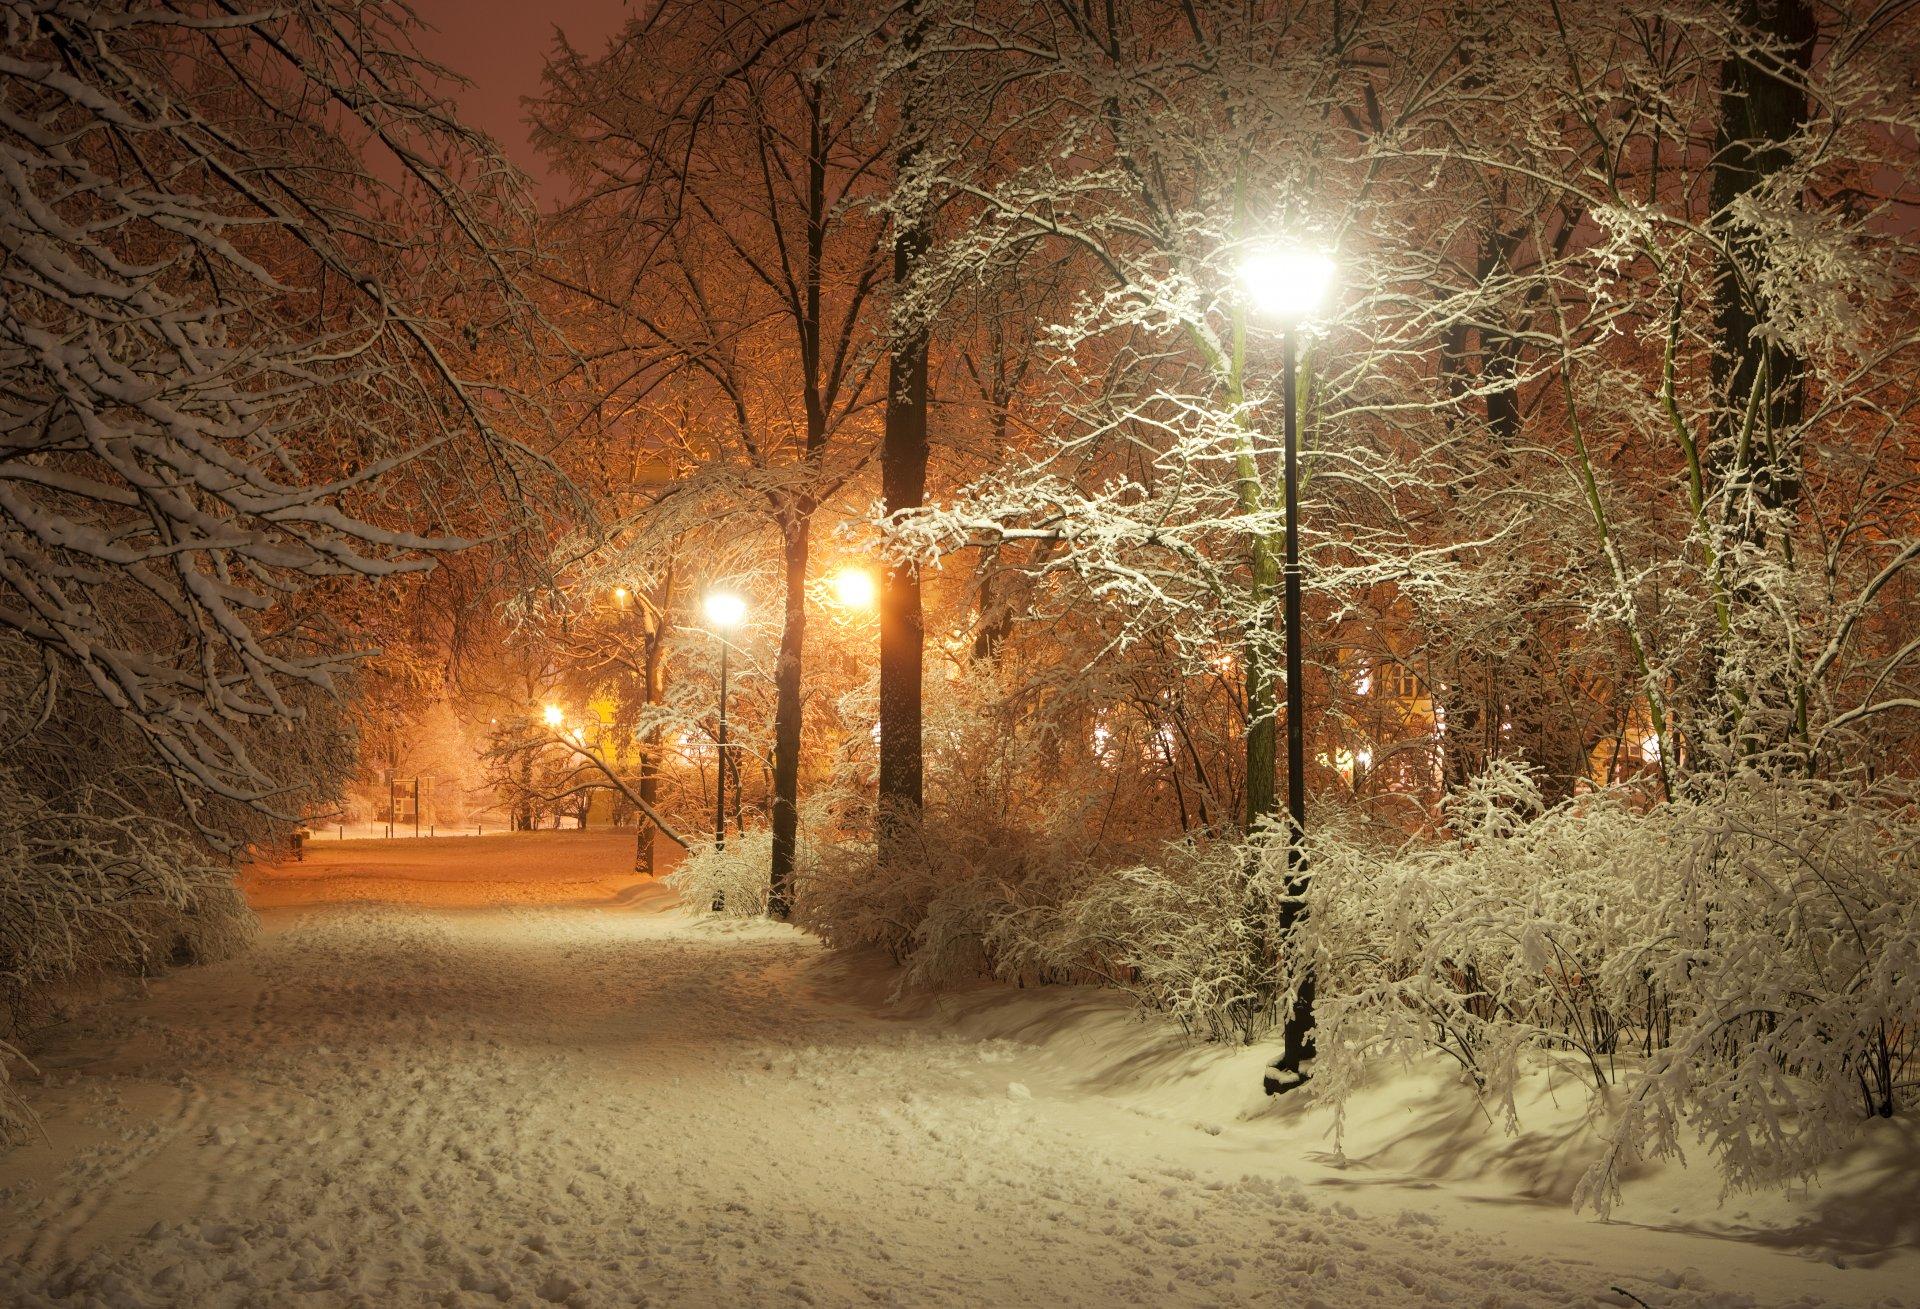 дорога зима вечер снег  № 3902632 бесплатно